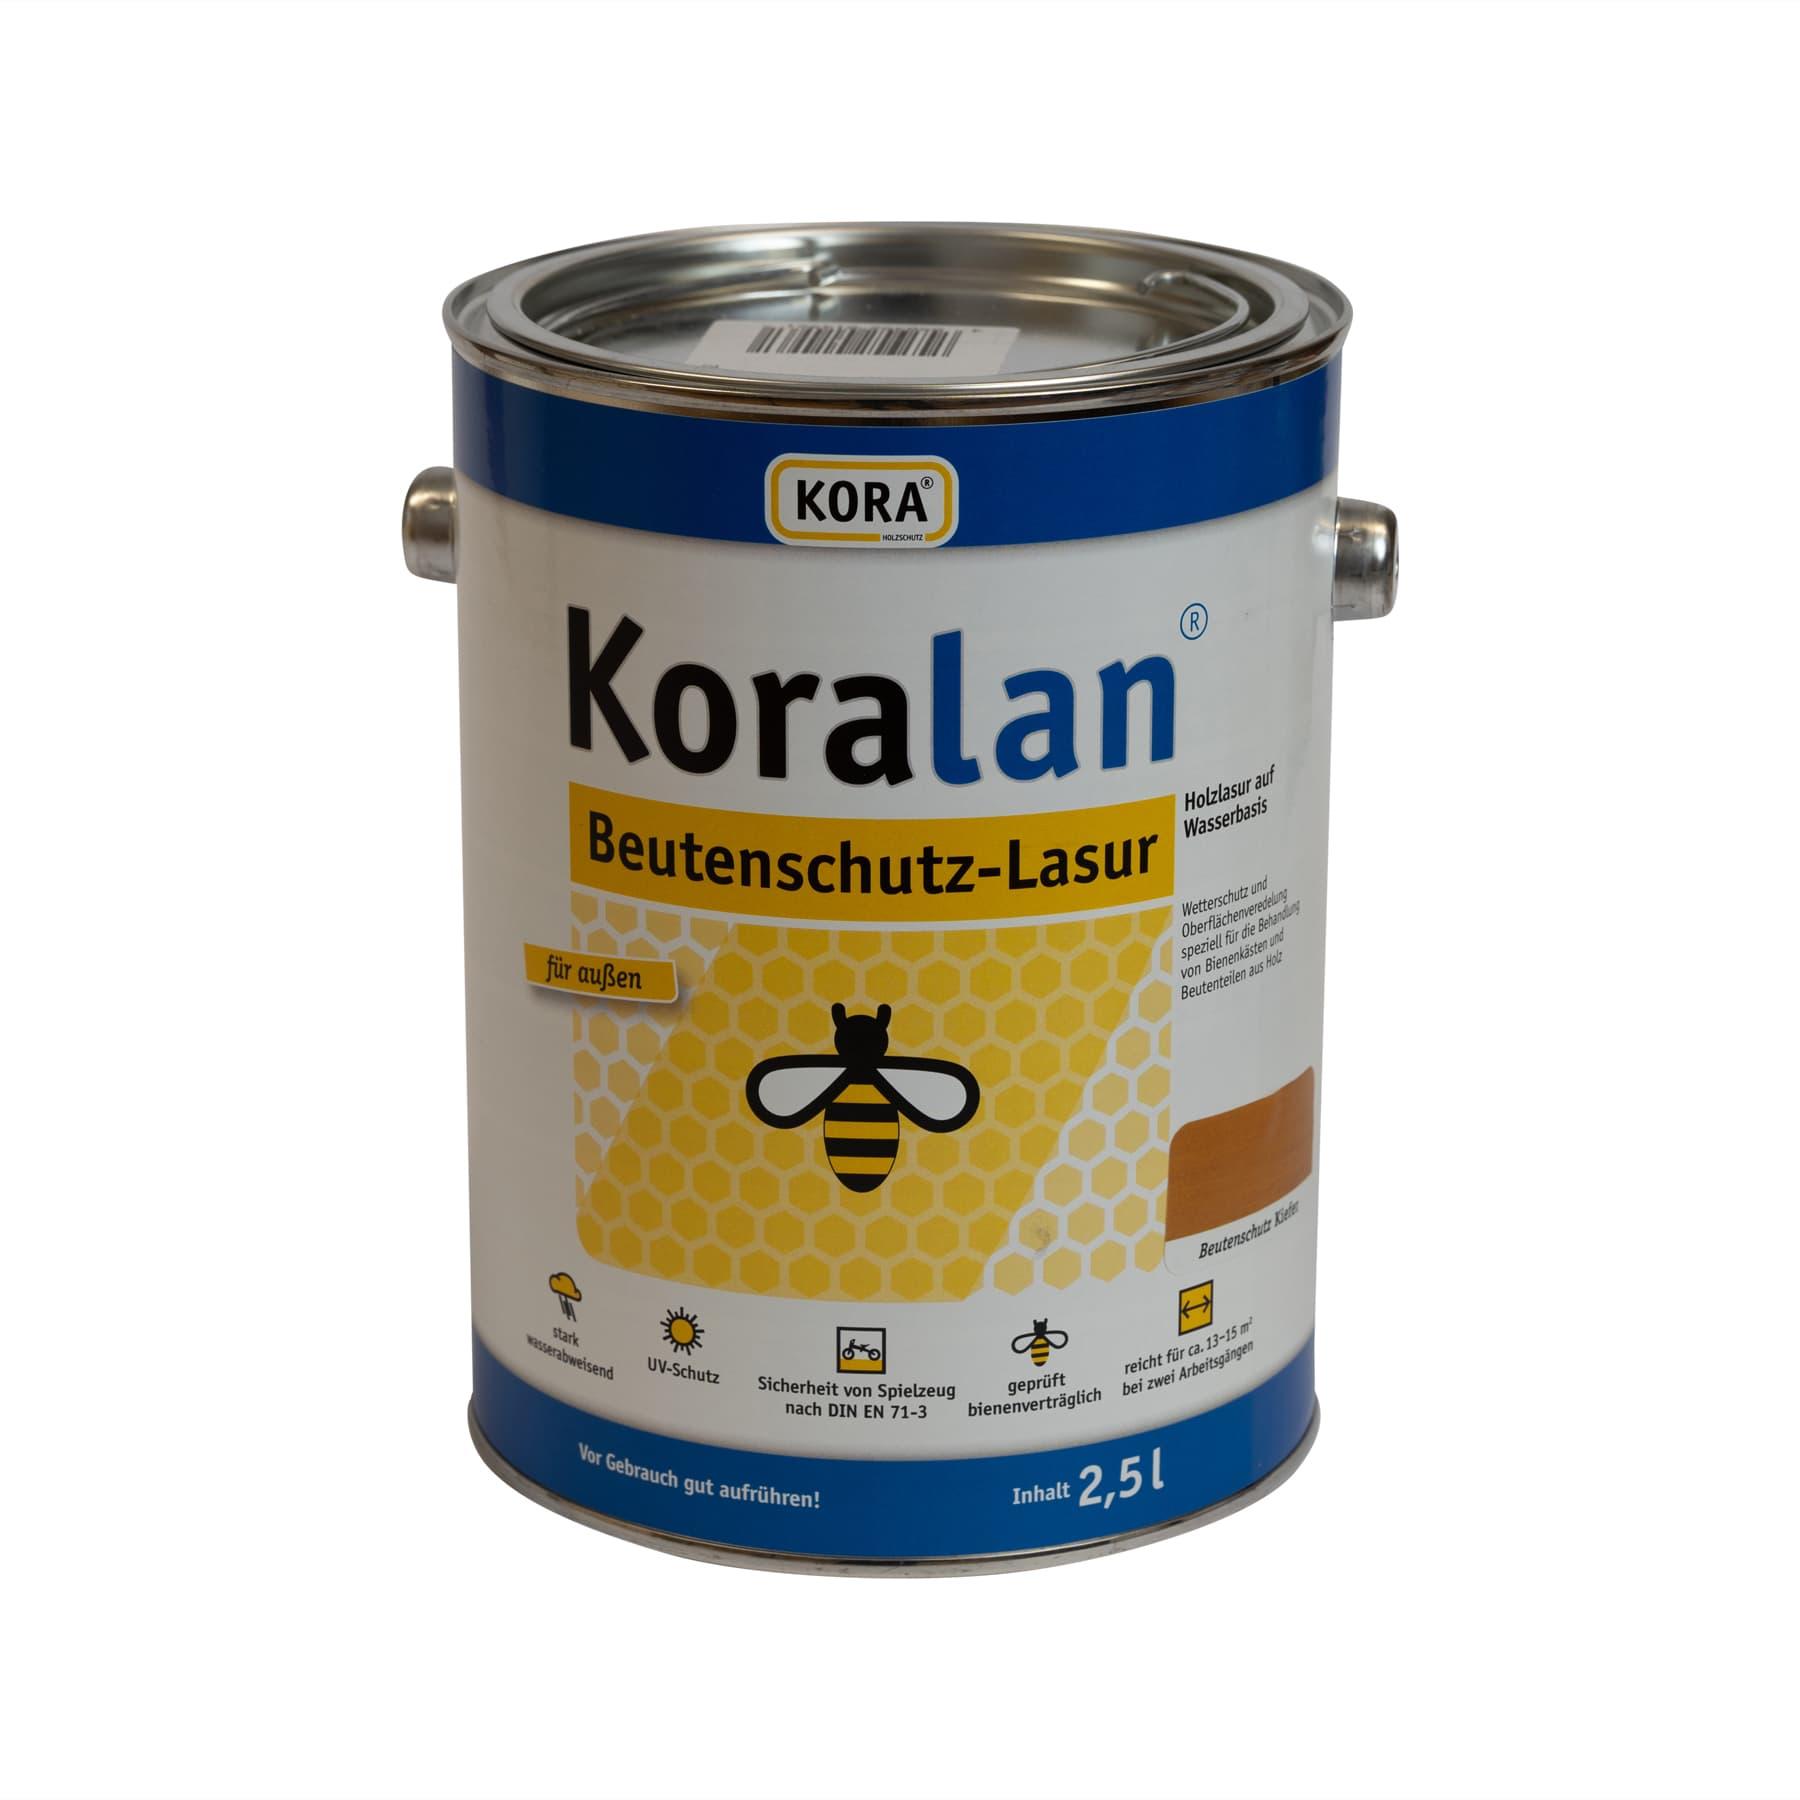 Koralan Beutenschutzlasur Kiefer 2,5 l Eimer